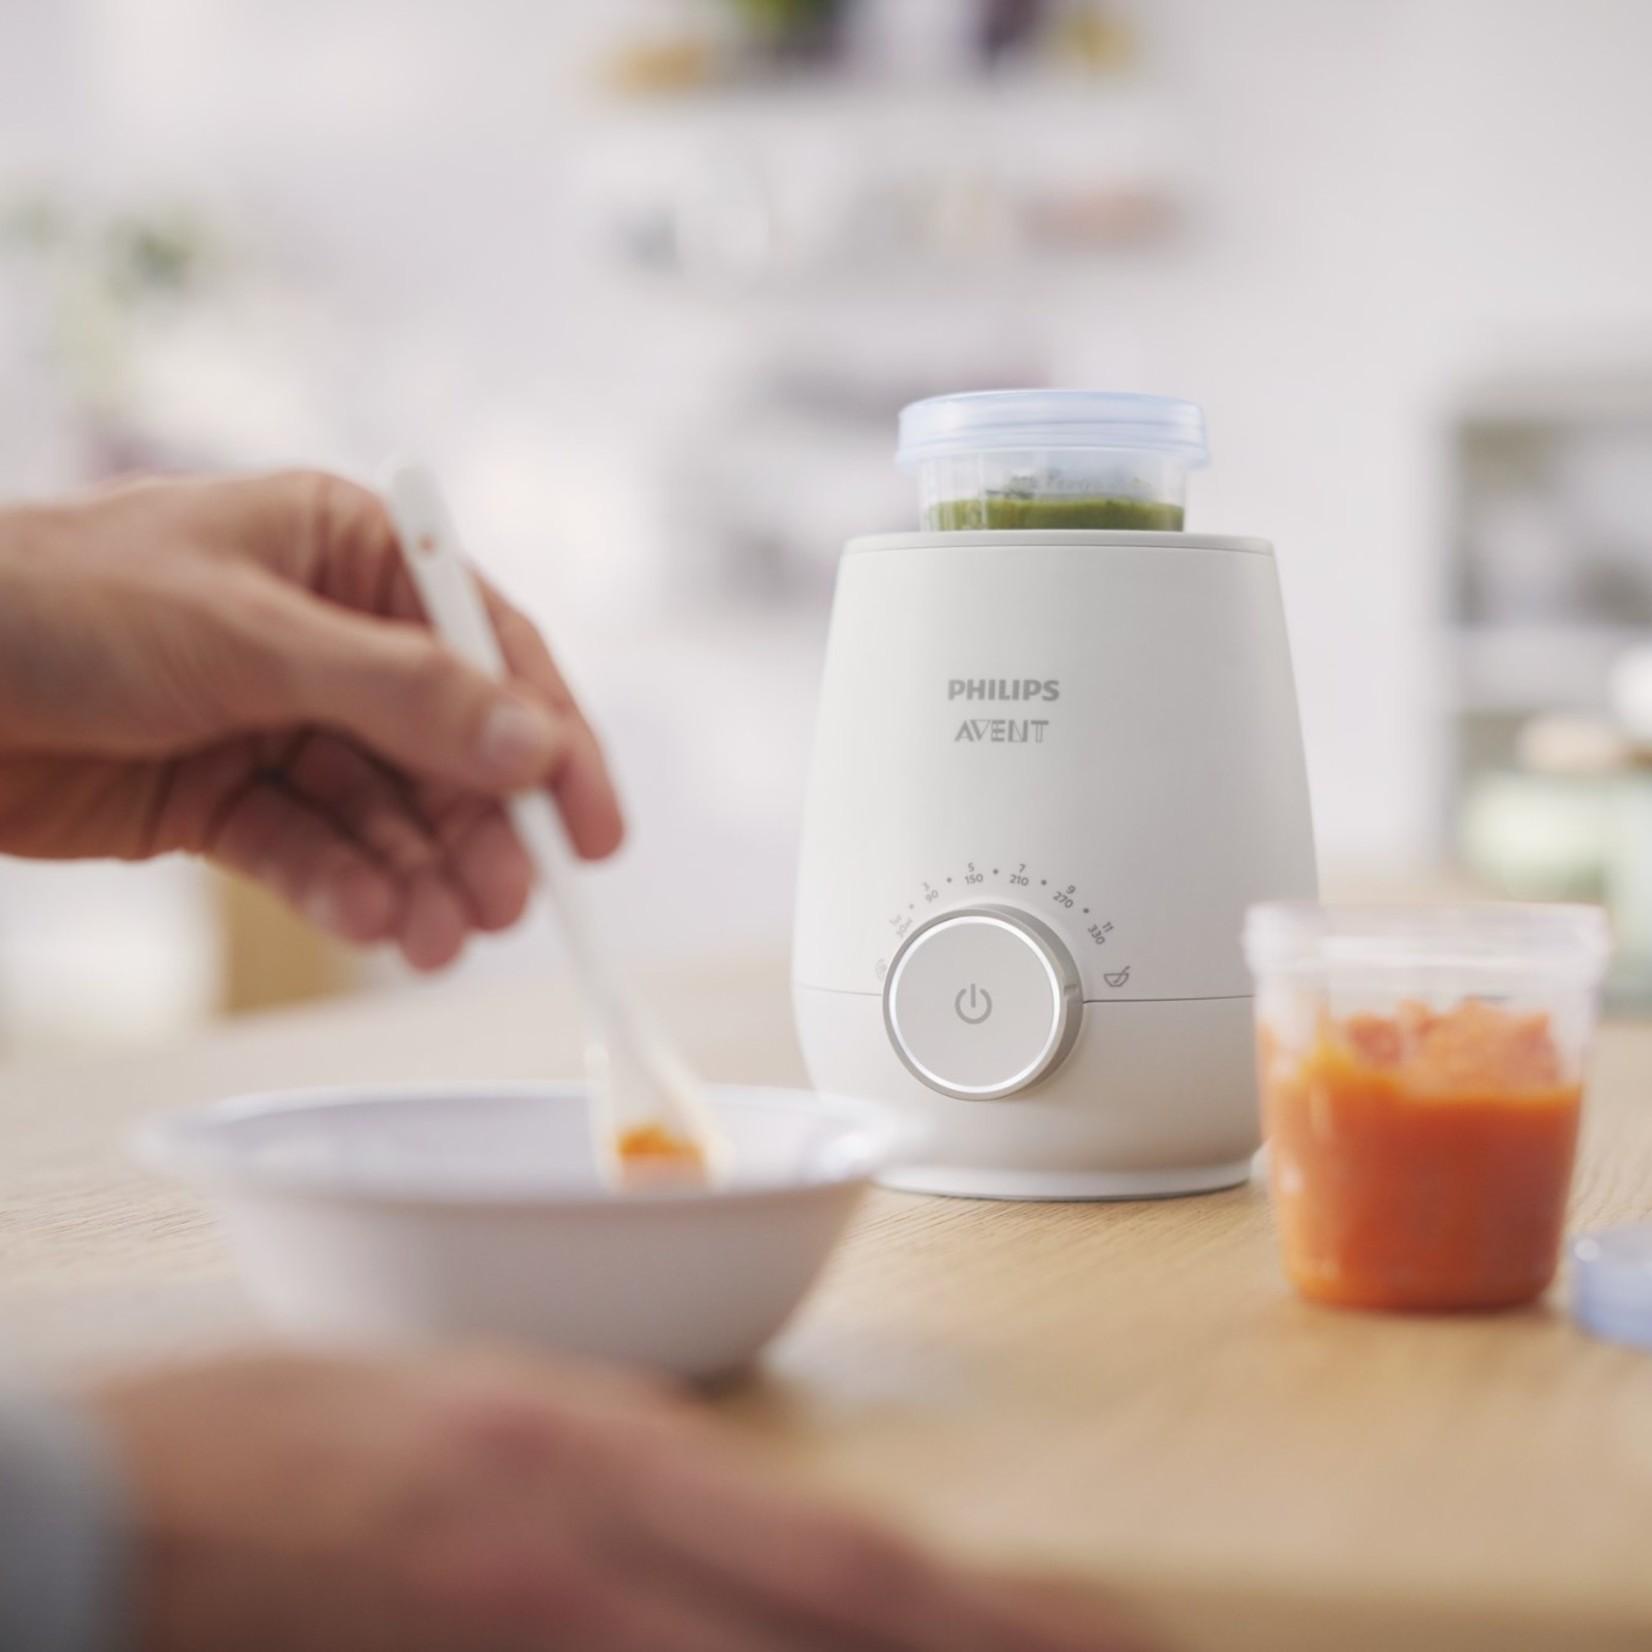 Philips-Avent Fleswarmer Premium